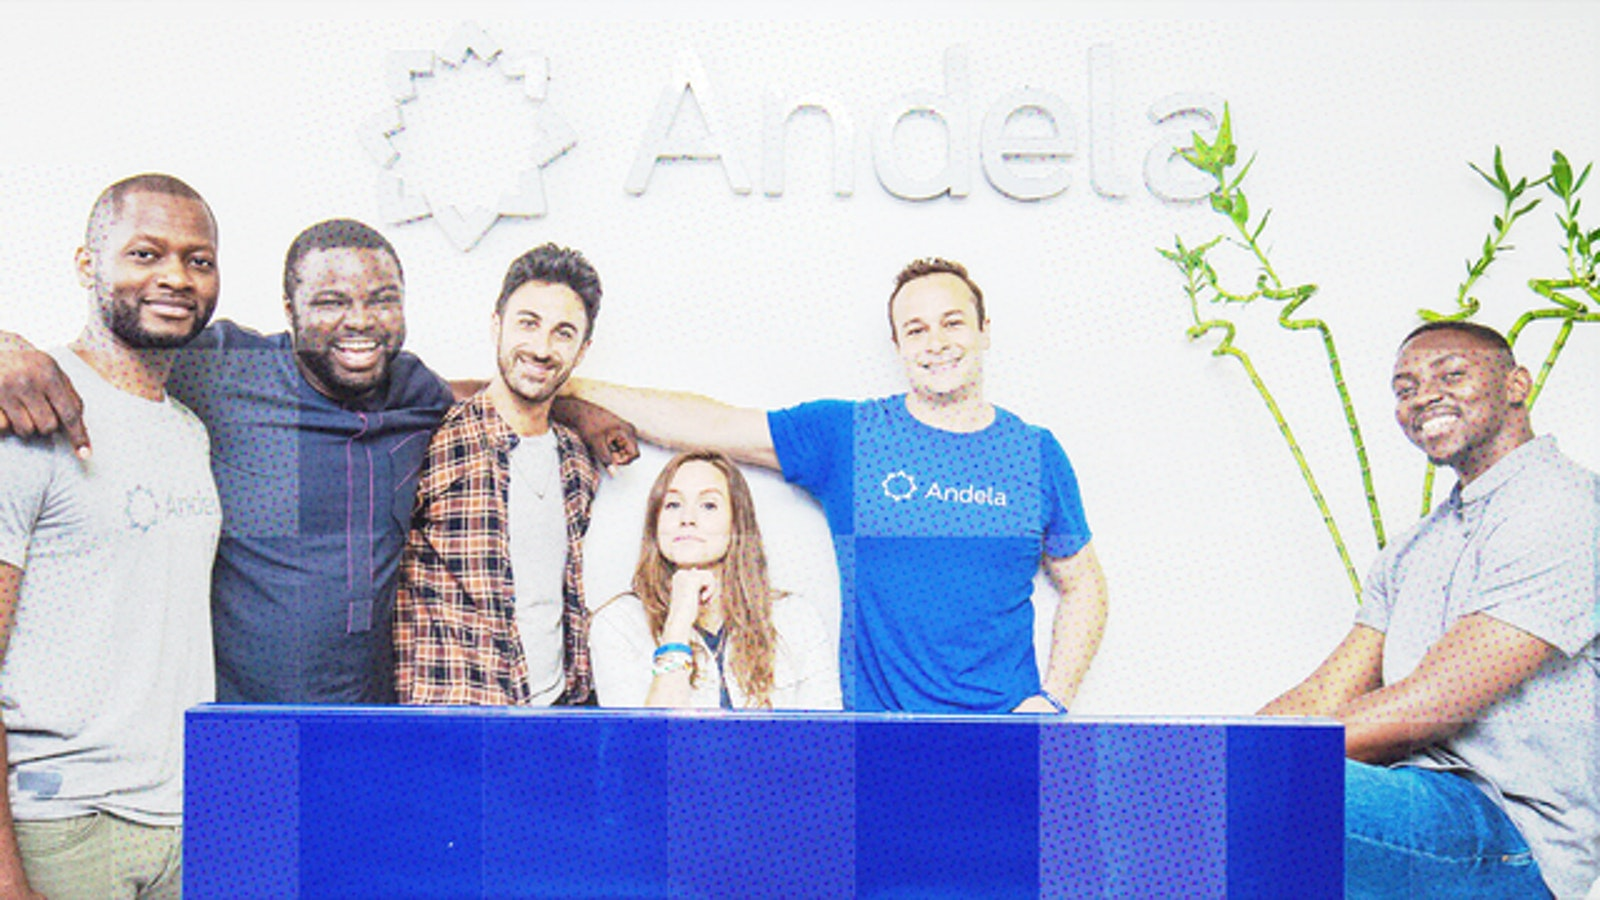 Andela co-founders, l.-r., Brice Nkengsa, Iyinoluwa Aboyeji, Ian Carnevale, Christina Sass, Jeremy Johnson, Nadayar Enegesi. Photo: Andela